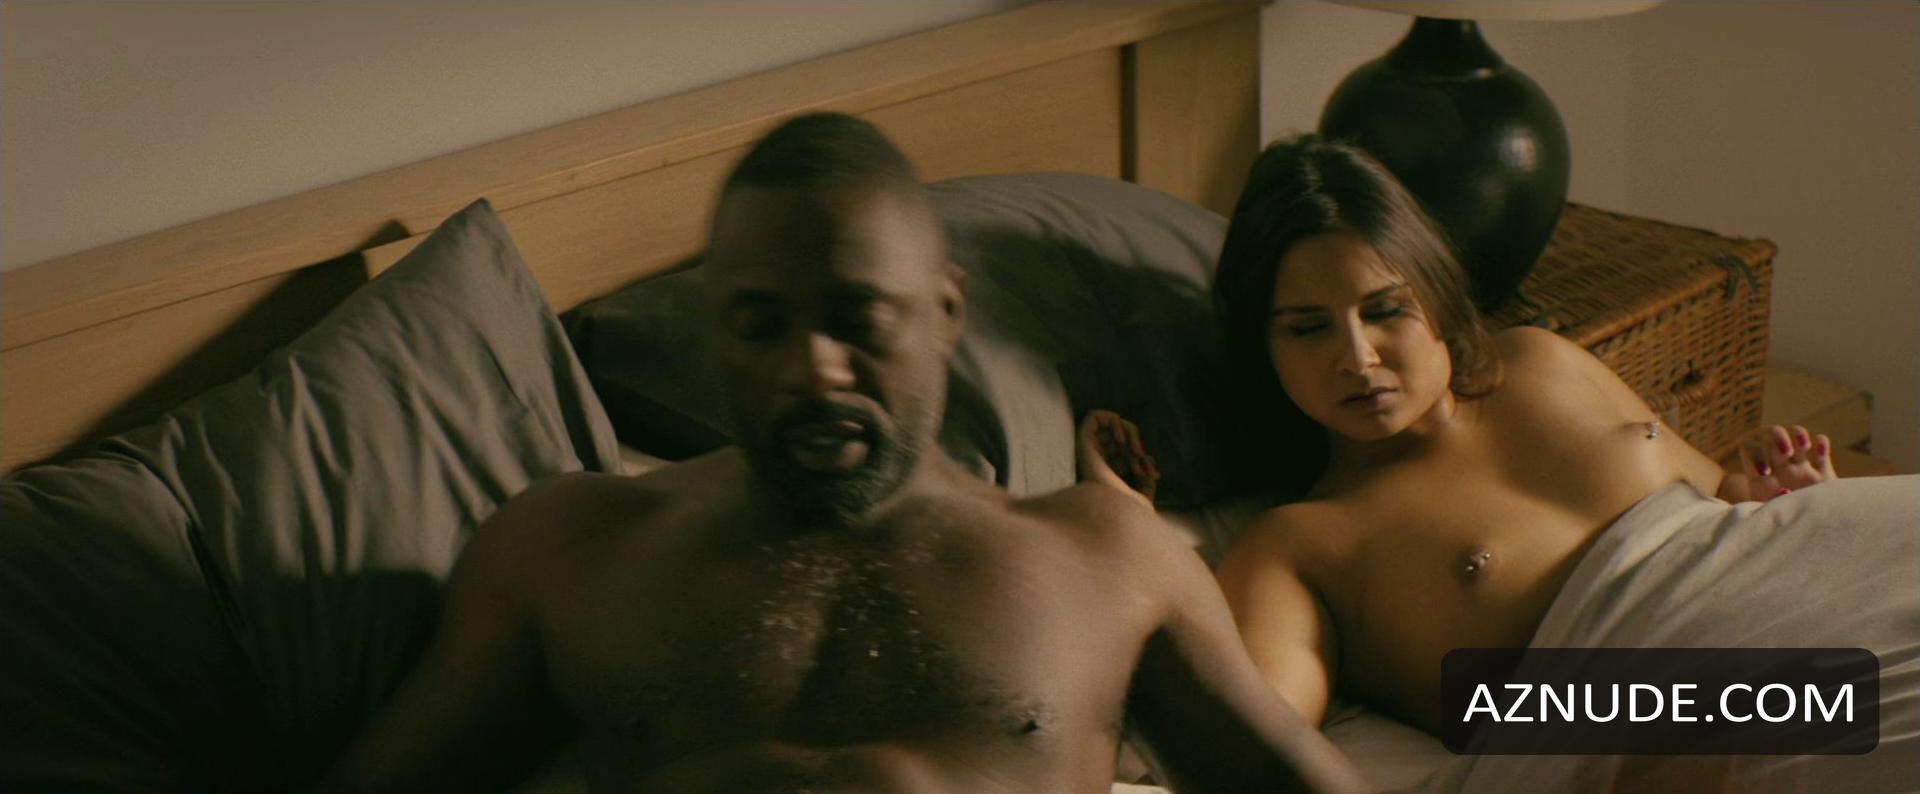 nudes (94 photo), Topless Celebrites images